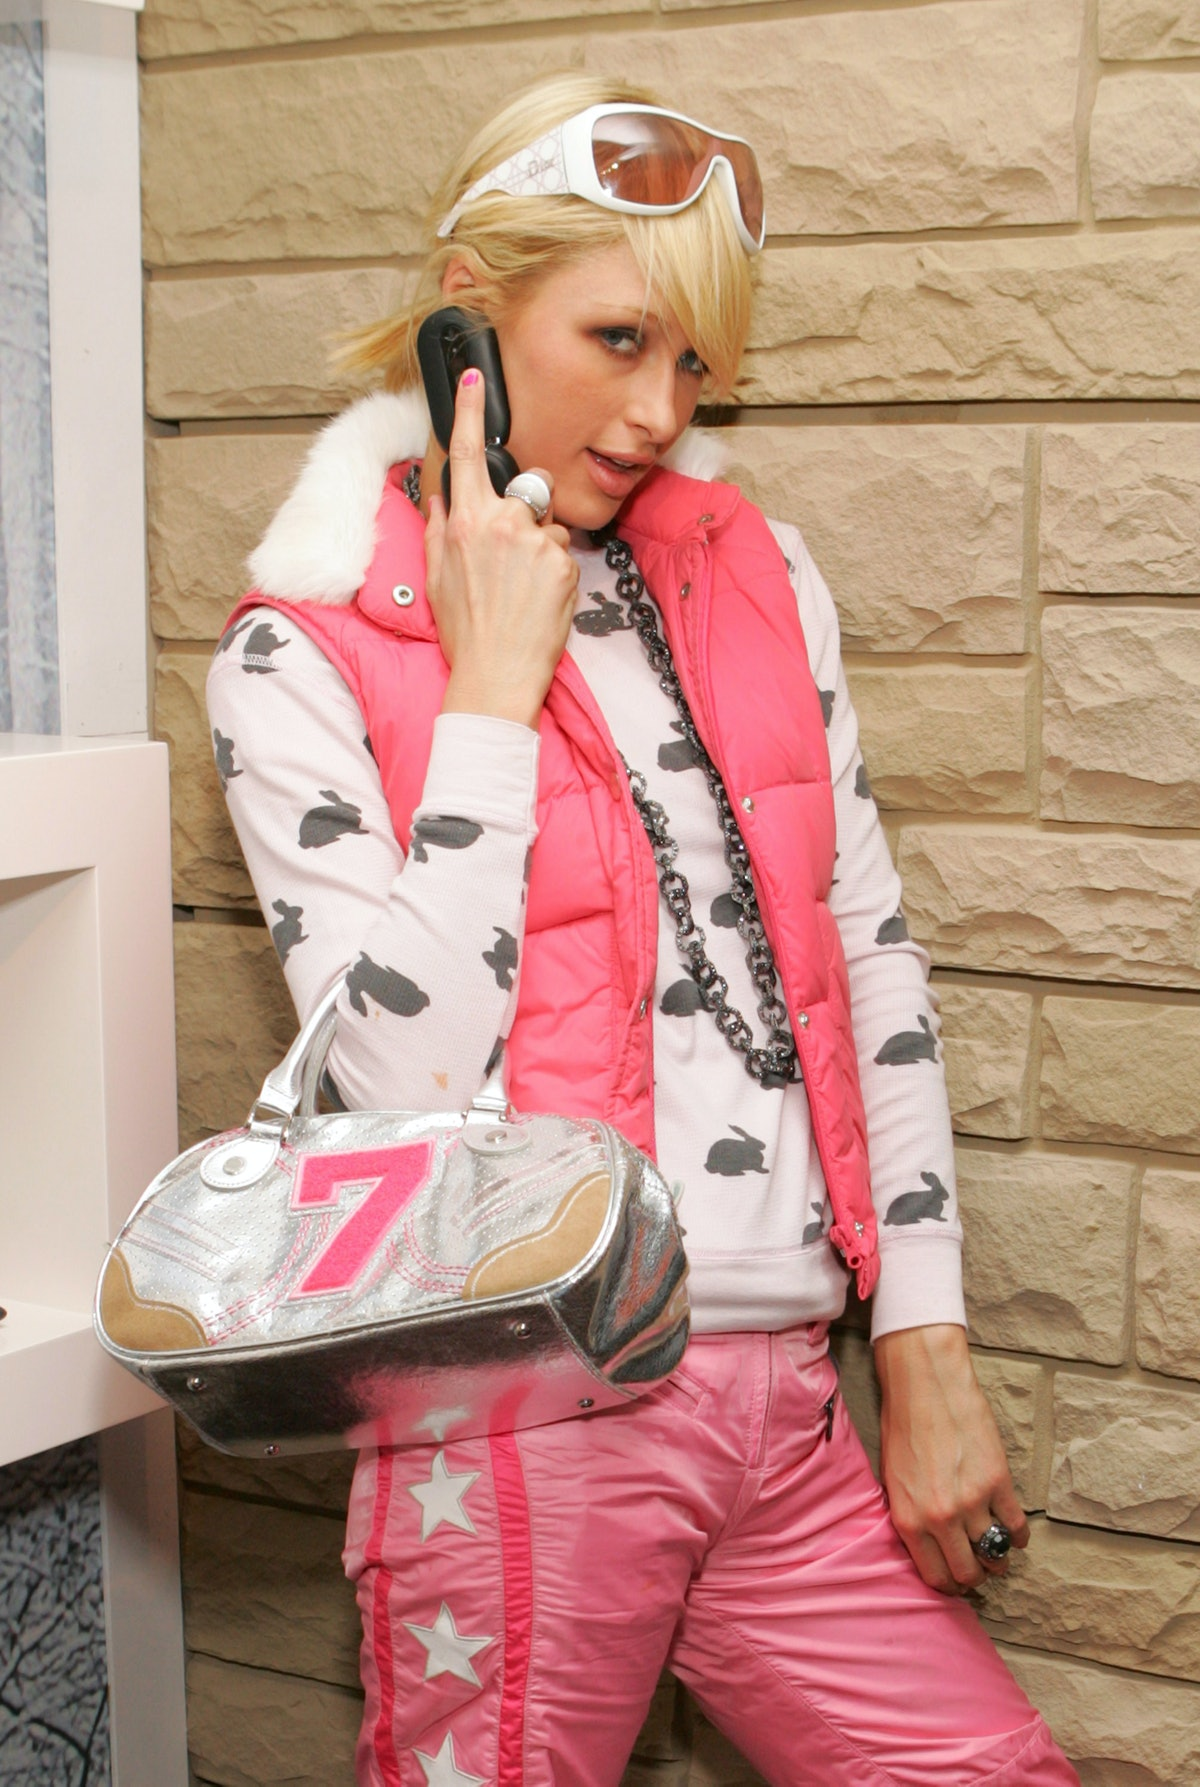 Paris Hilton on the phone